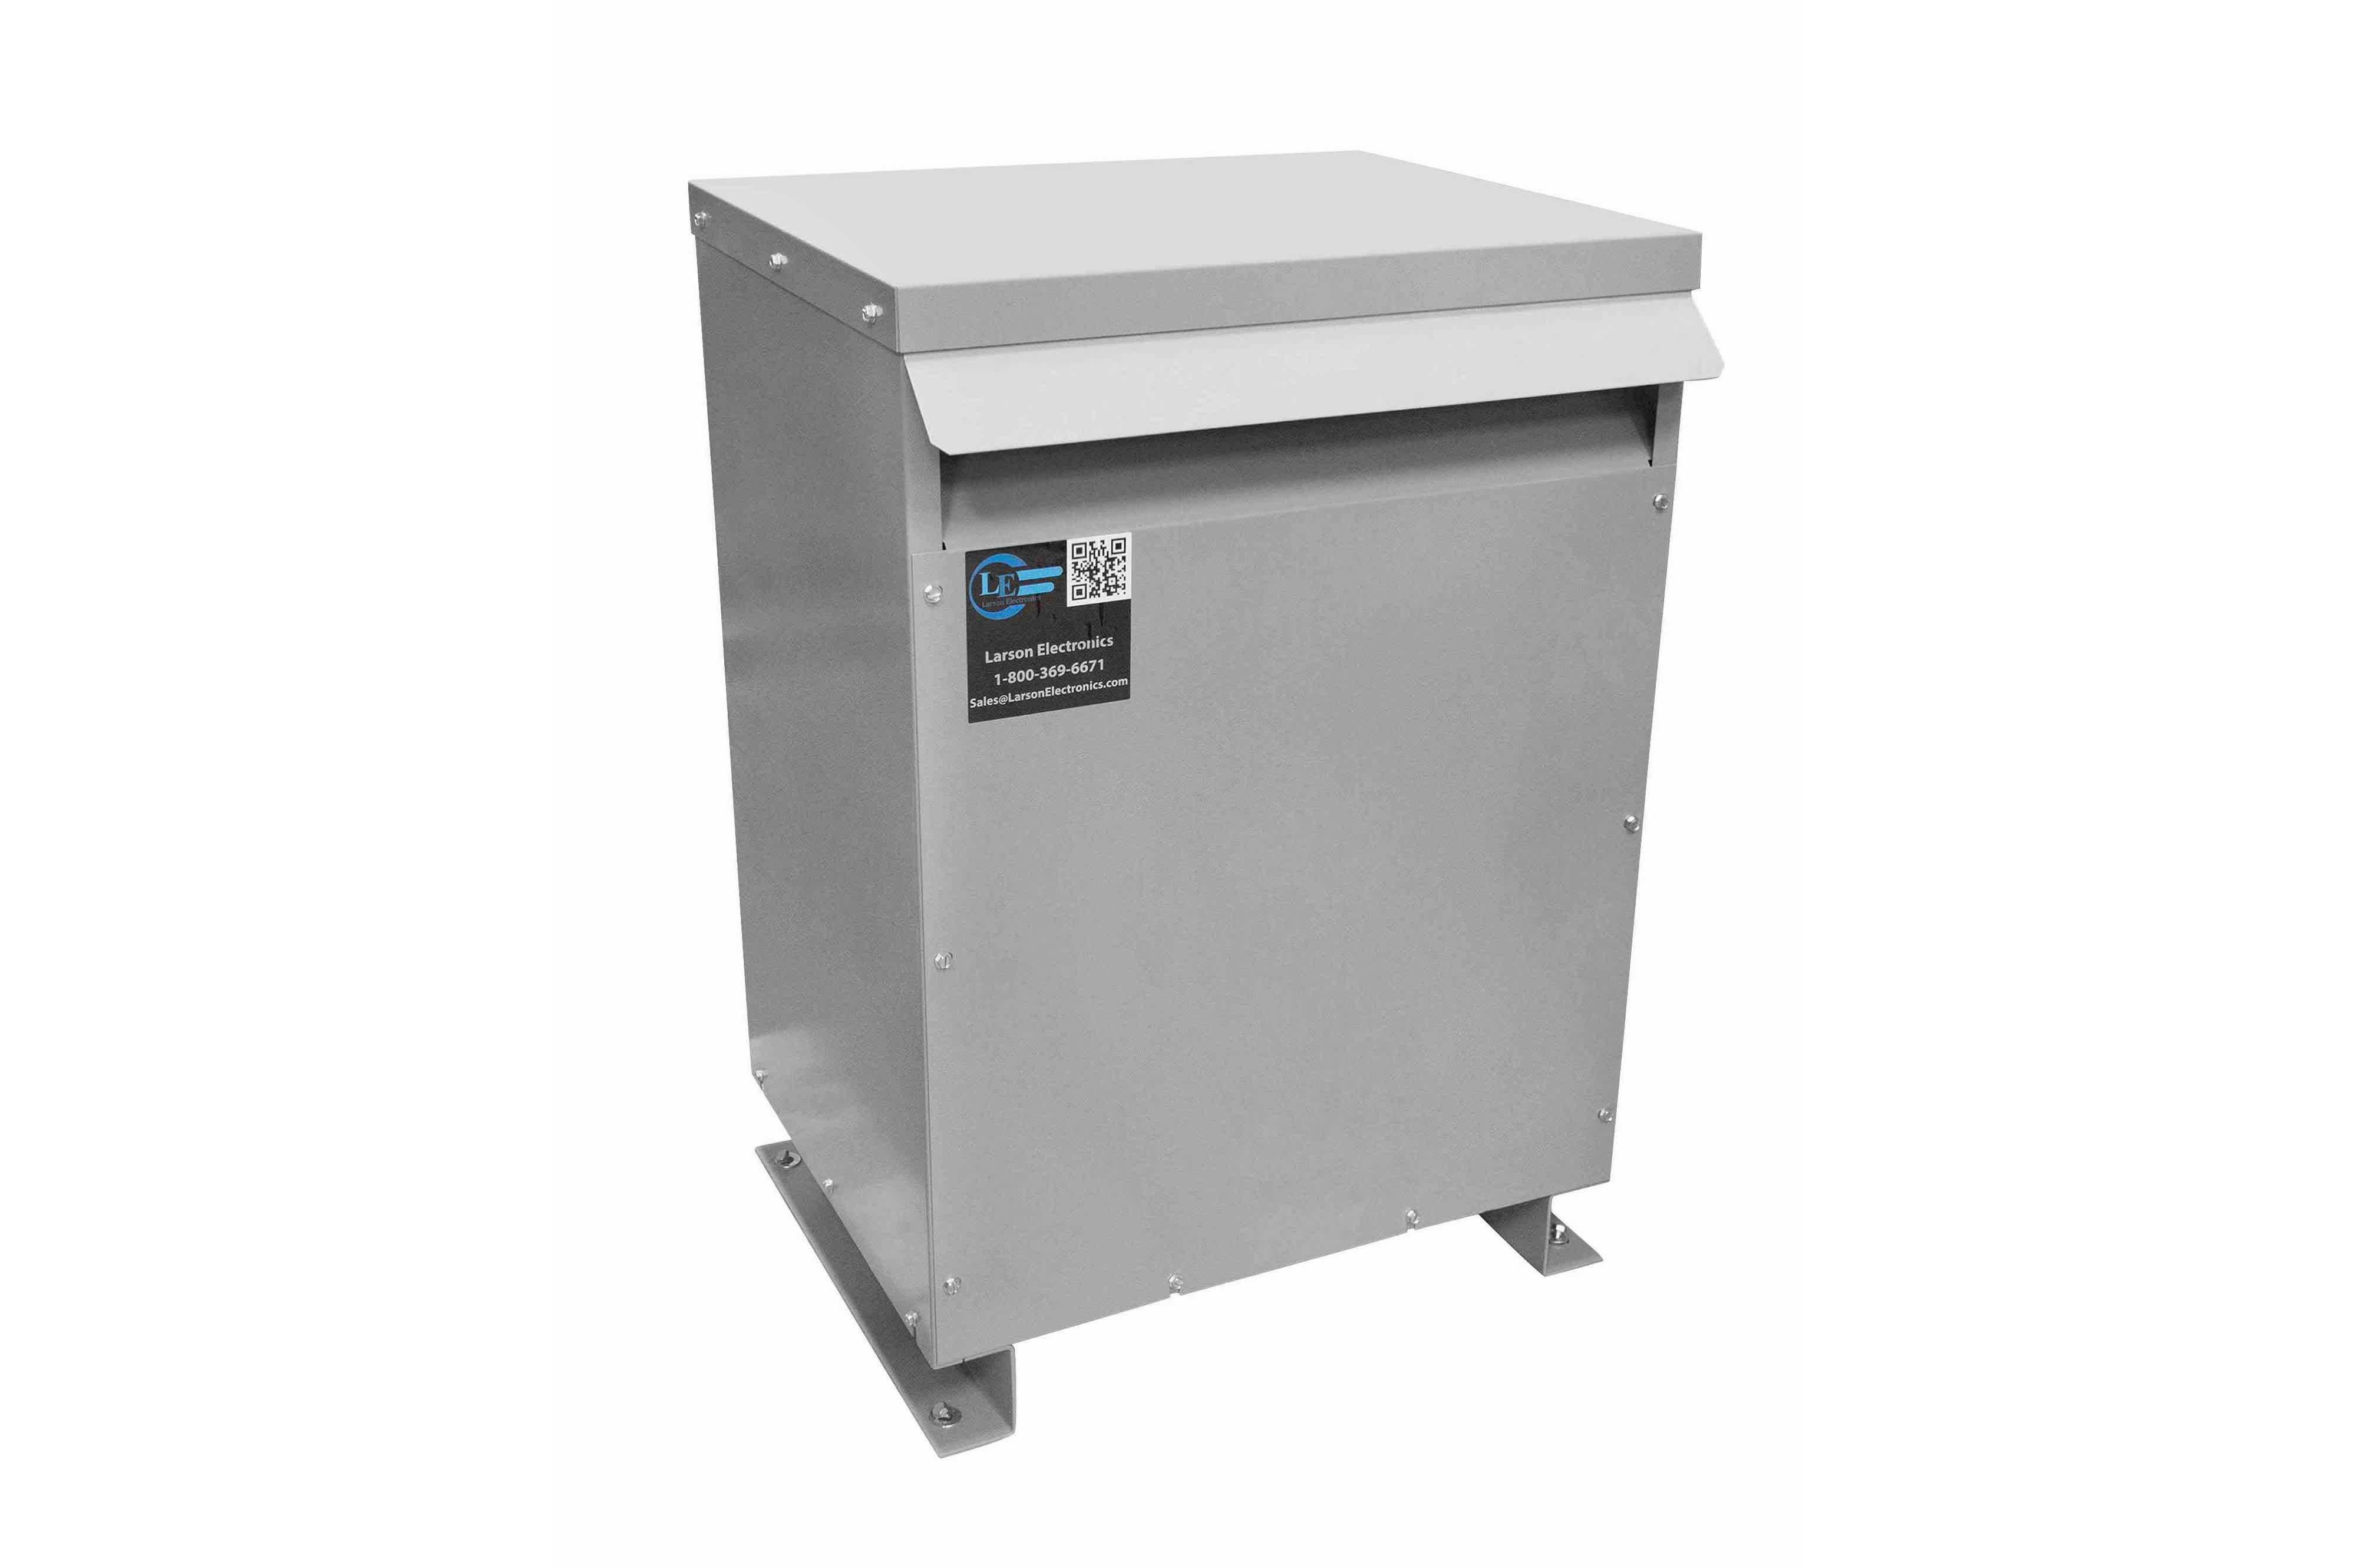 50 kVA 3PH DOE Transformer, 400V Delta Primary, 208Y/120 Wye-N Secondary, N3R, Ventilated, 60 Hz